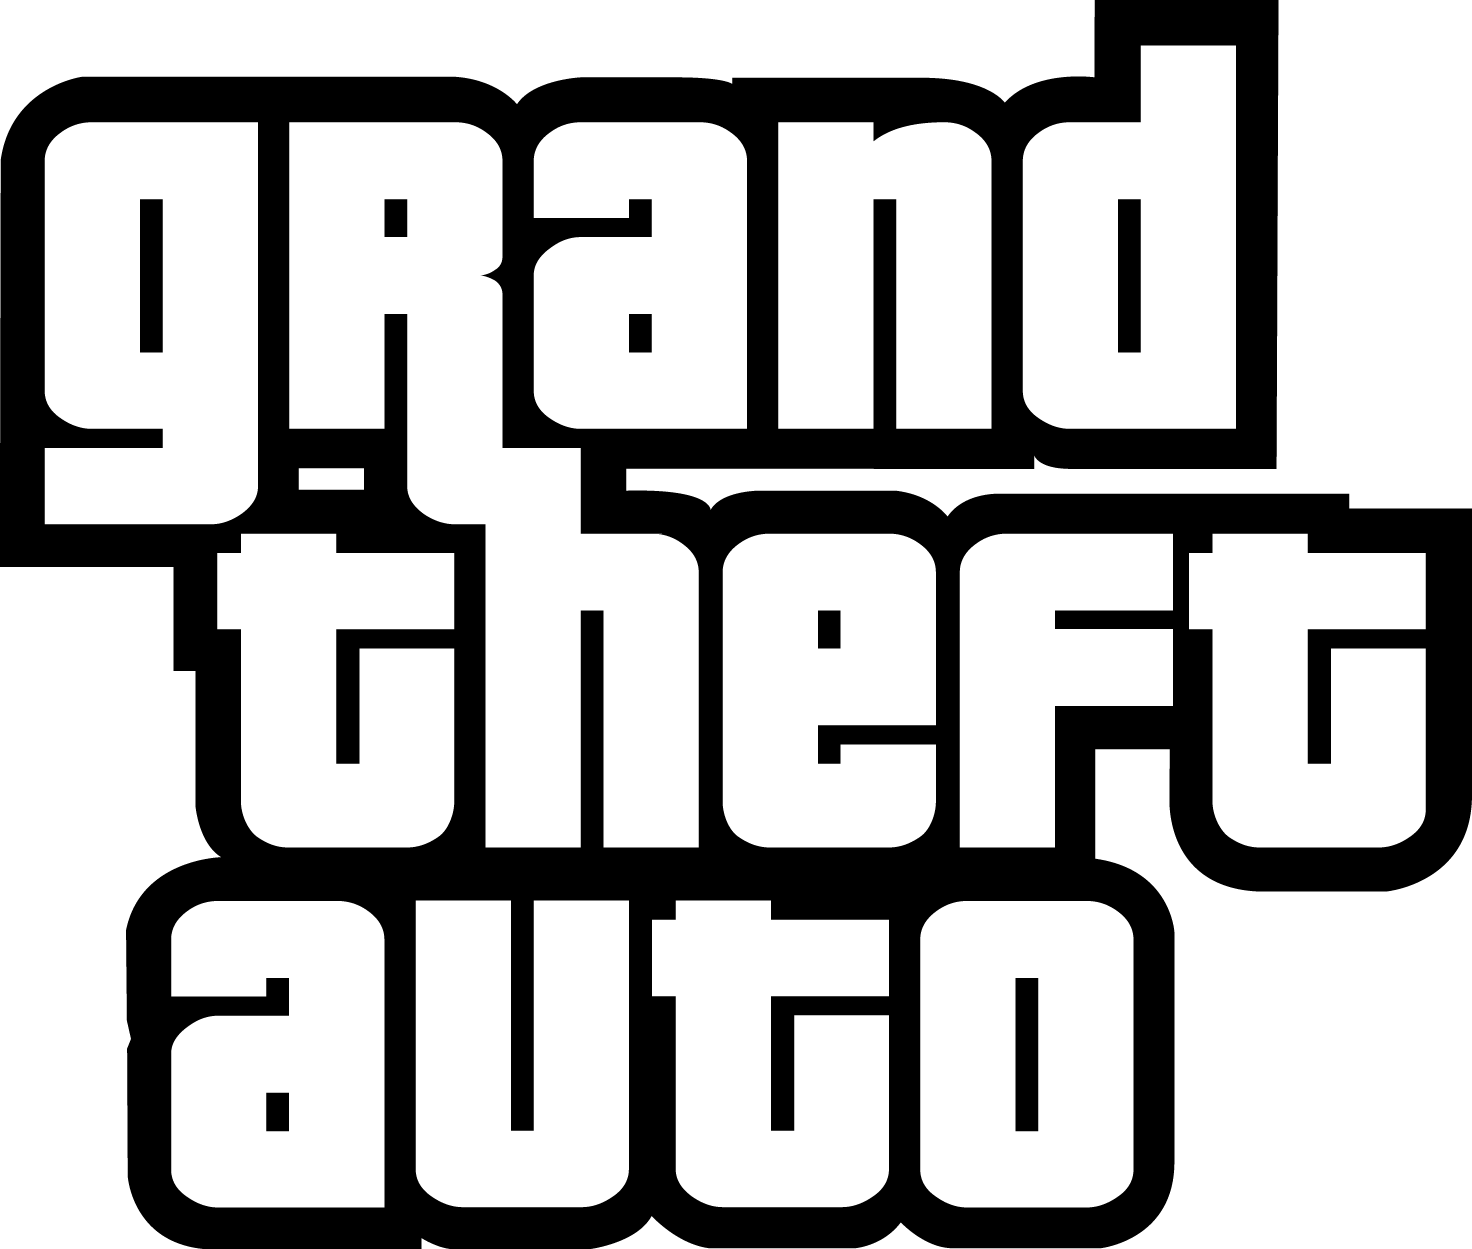 GTA Logo [Grand Theft Auto - PDF] PNG Free Downloads, Logo Brand Emblems - Gta PNG